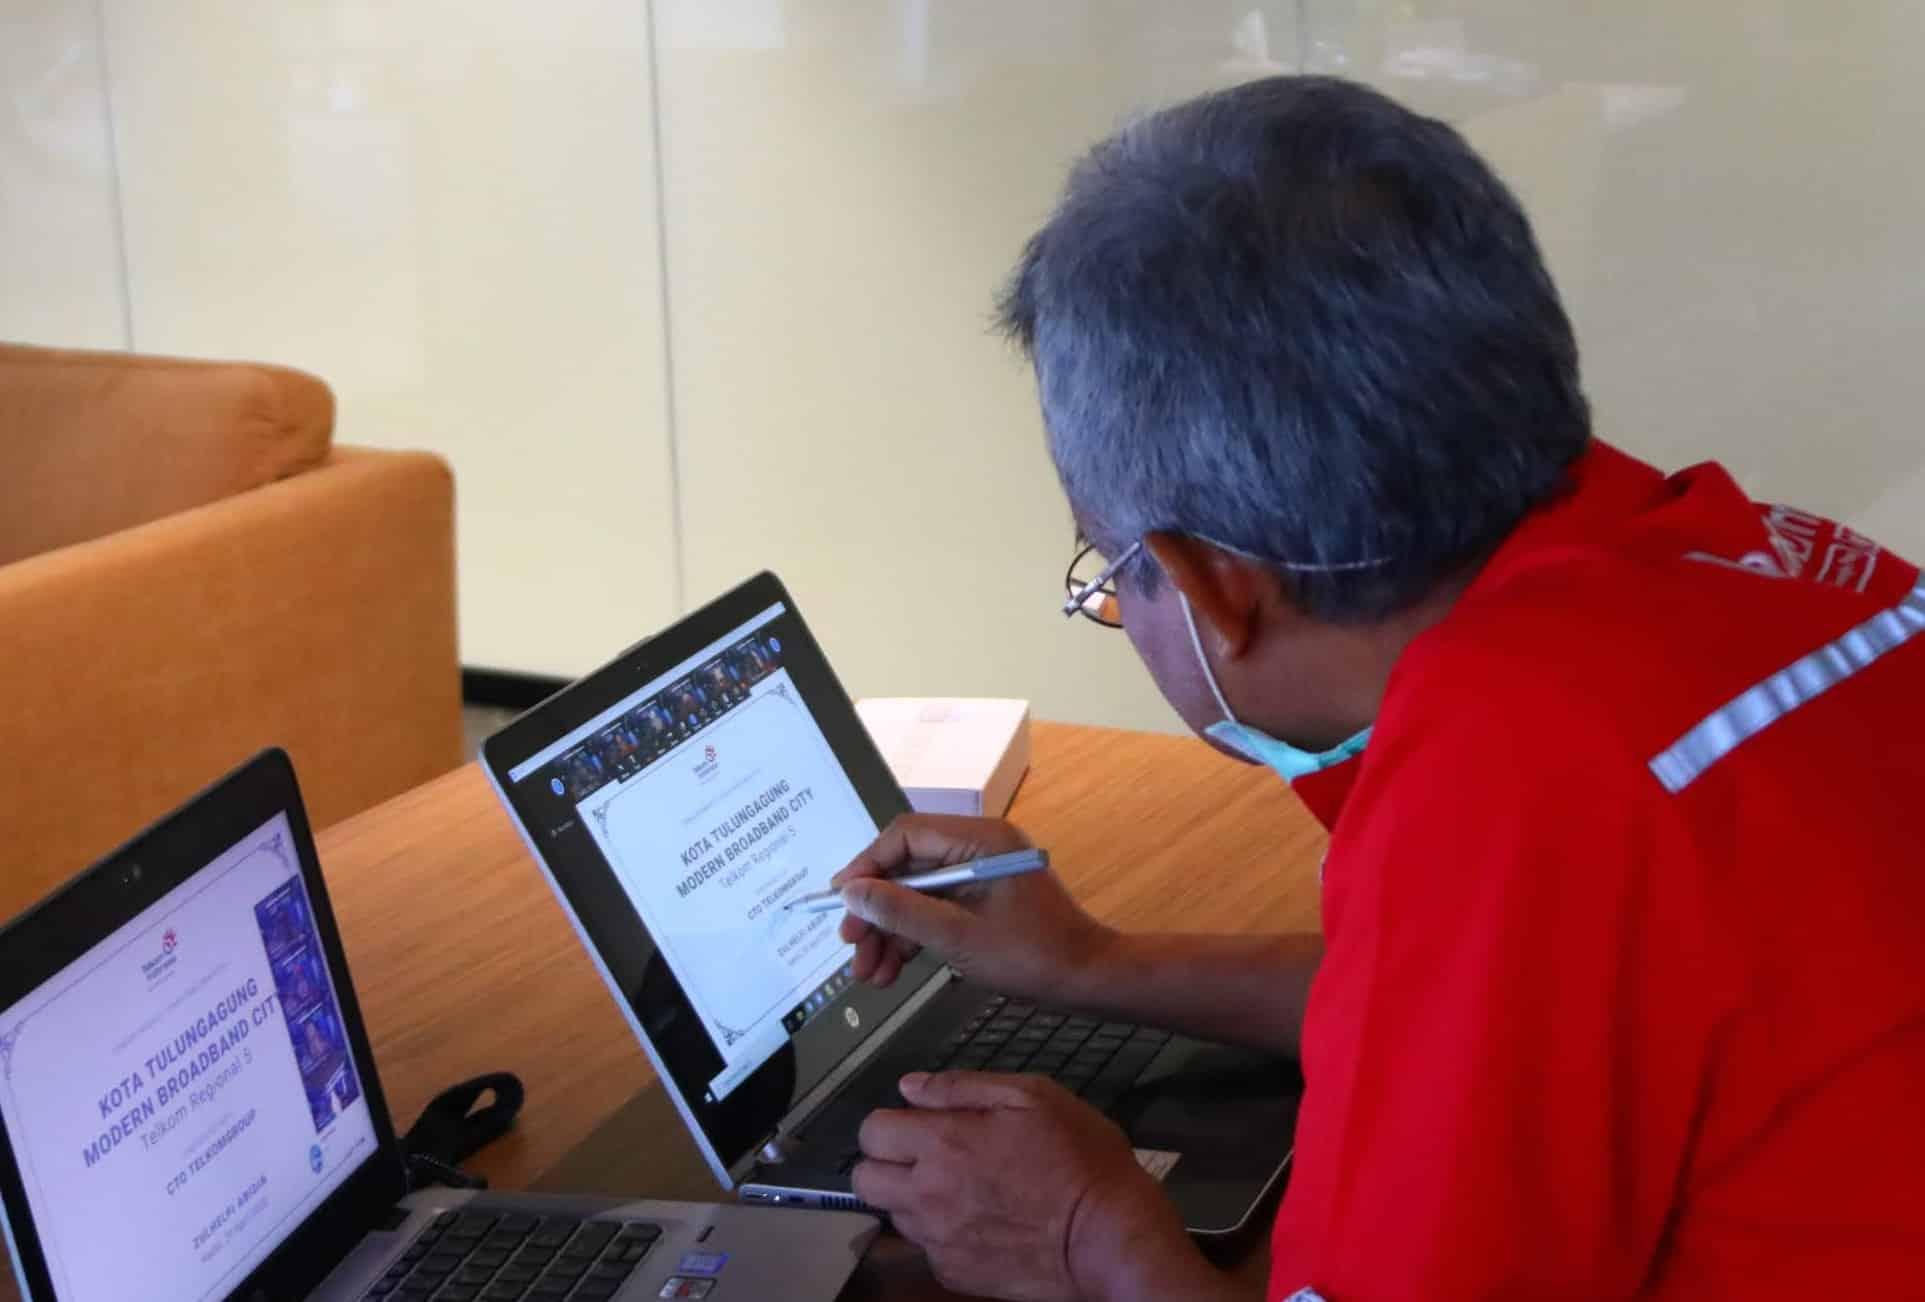 Direktur Network & IT Solution Telkom Zulhelfi Abidin